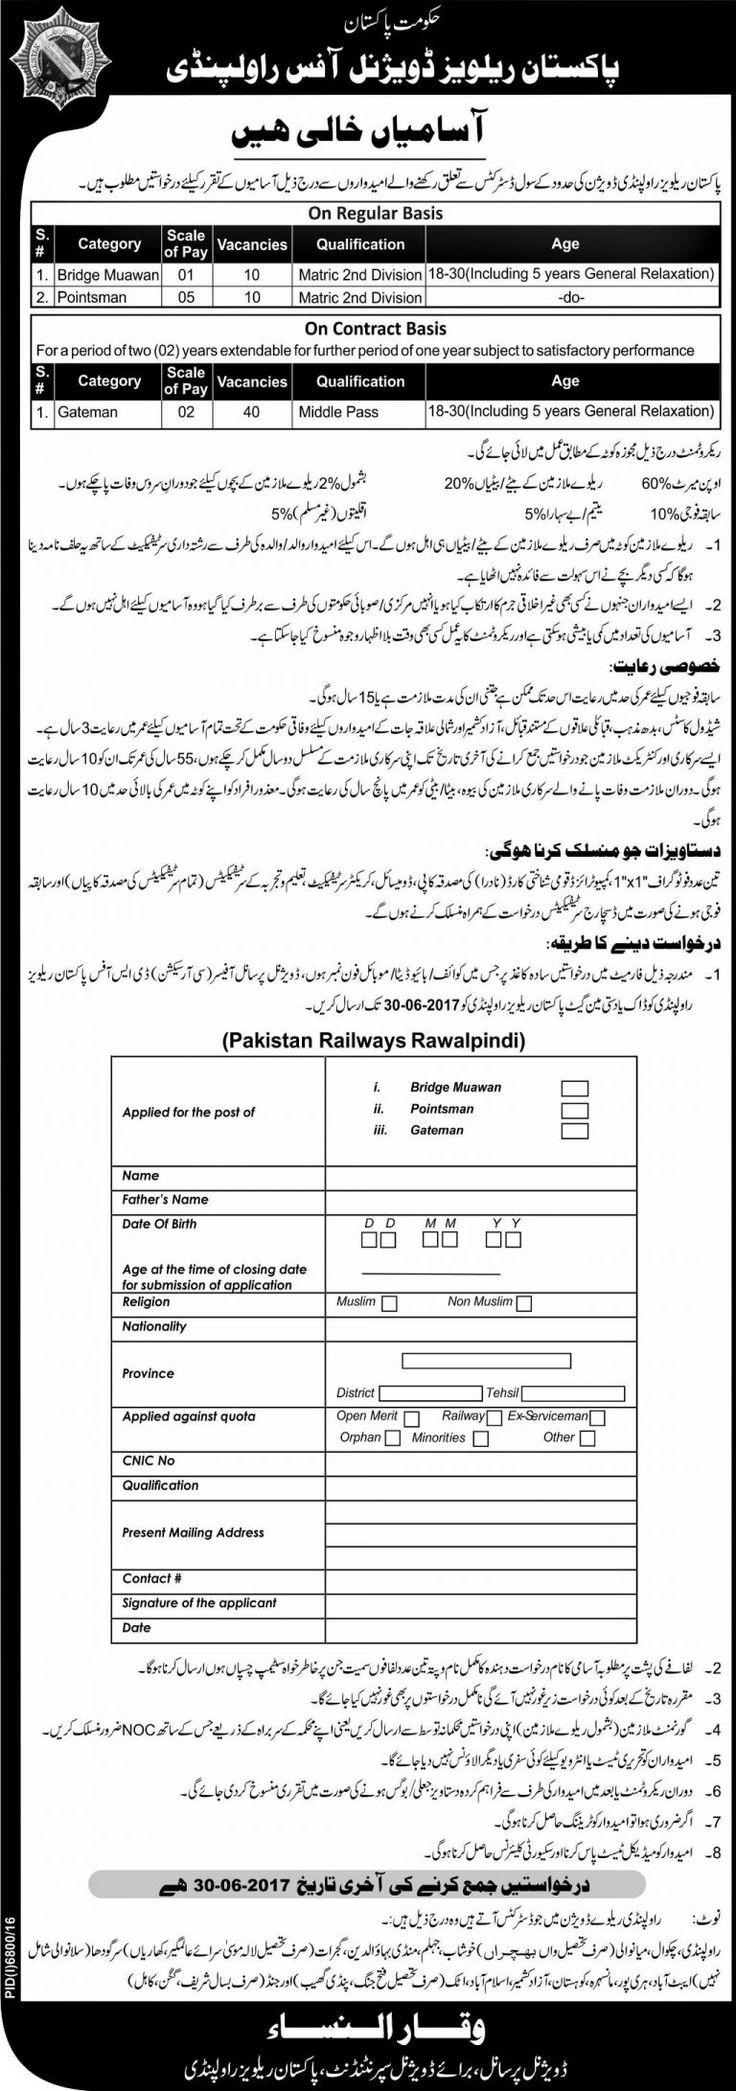 Pakistan railways jobs 2017 for 60 pointsman gateman muawan staff vacancies the